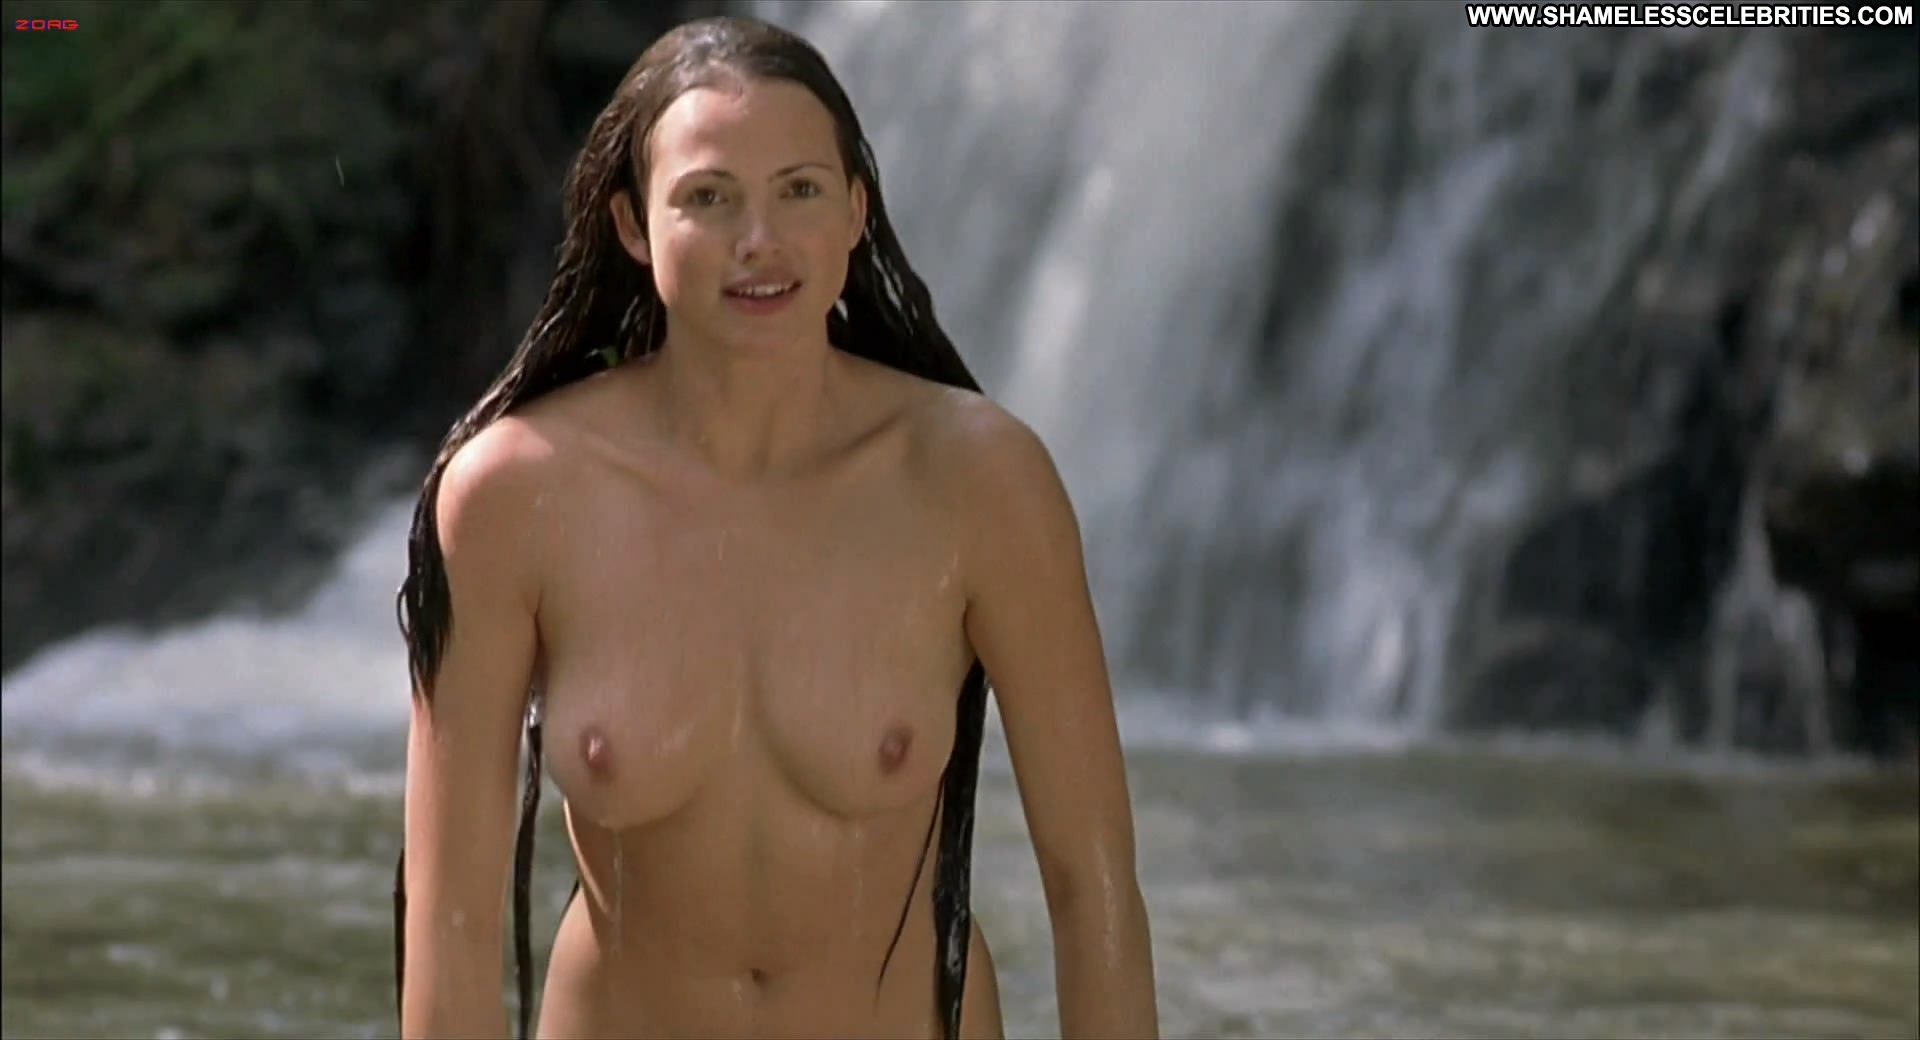 Permalink to Elisabetta Canalis Topless Photos